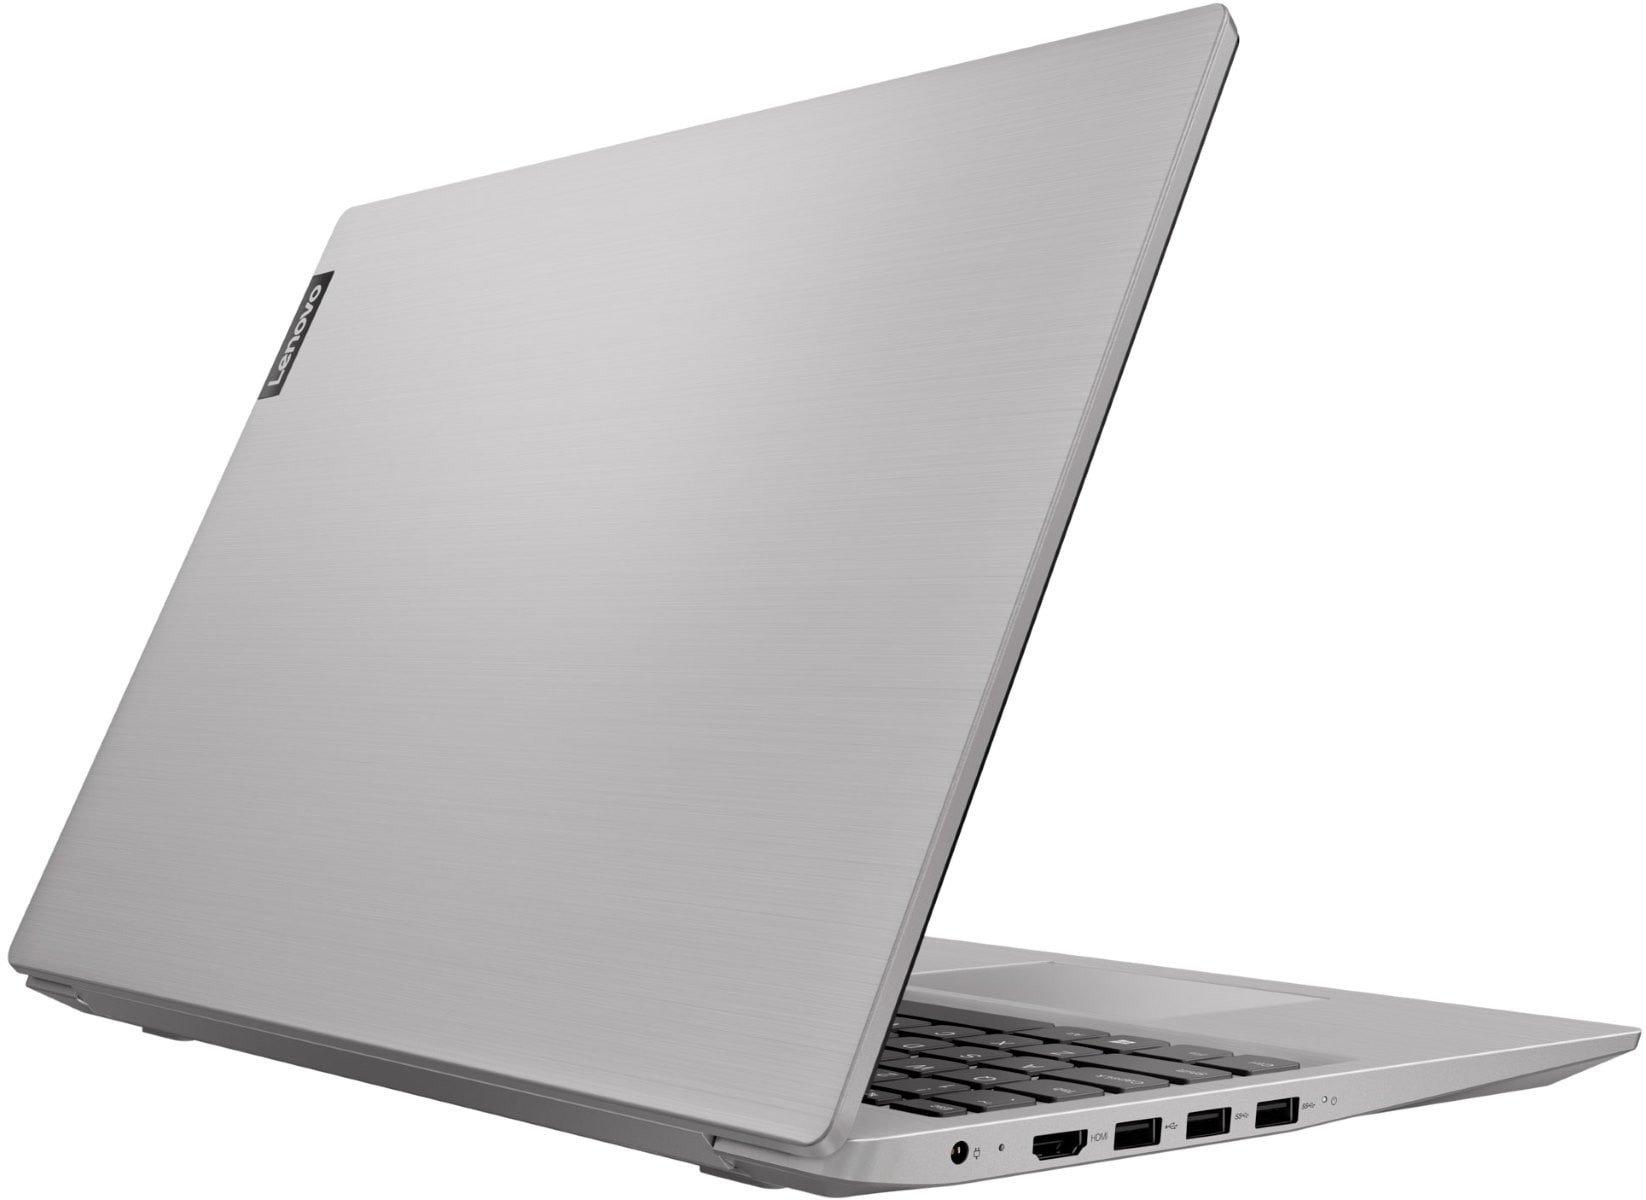 PC Portable LENOVO IdeaPad S20 Dual Core 20Go 20To Gris chez WIKI ...